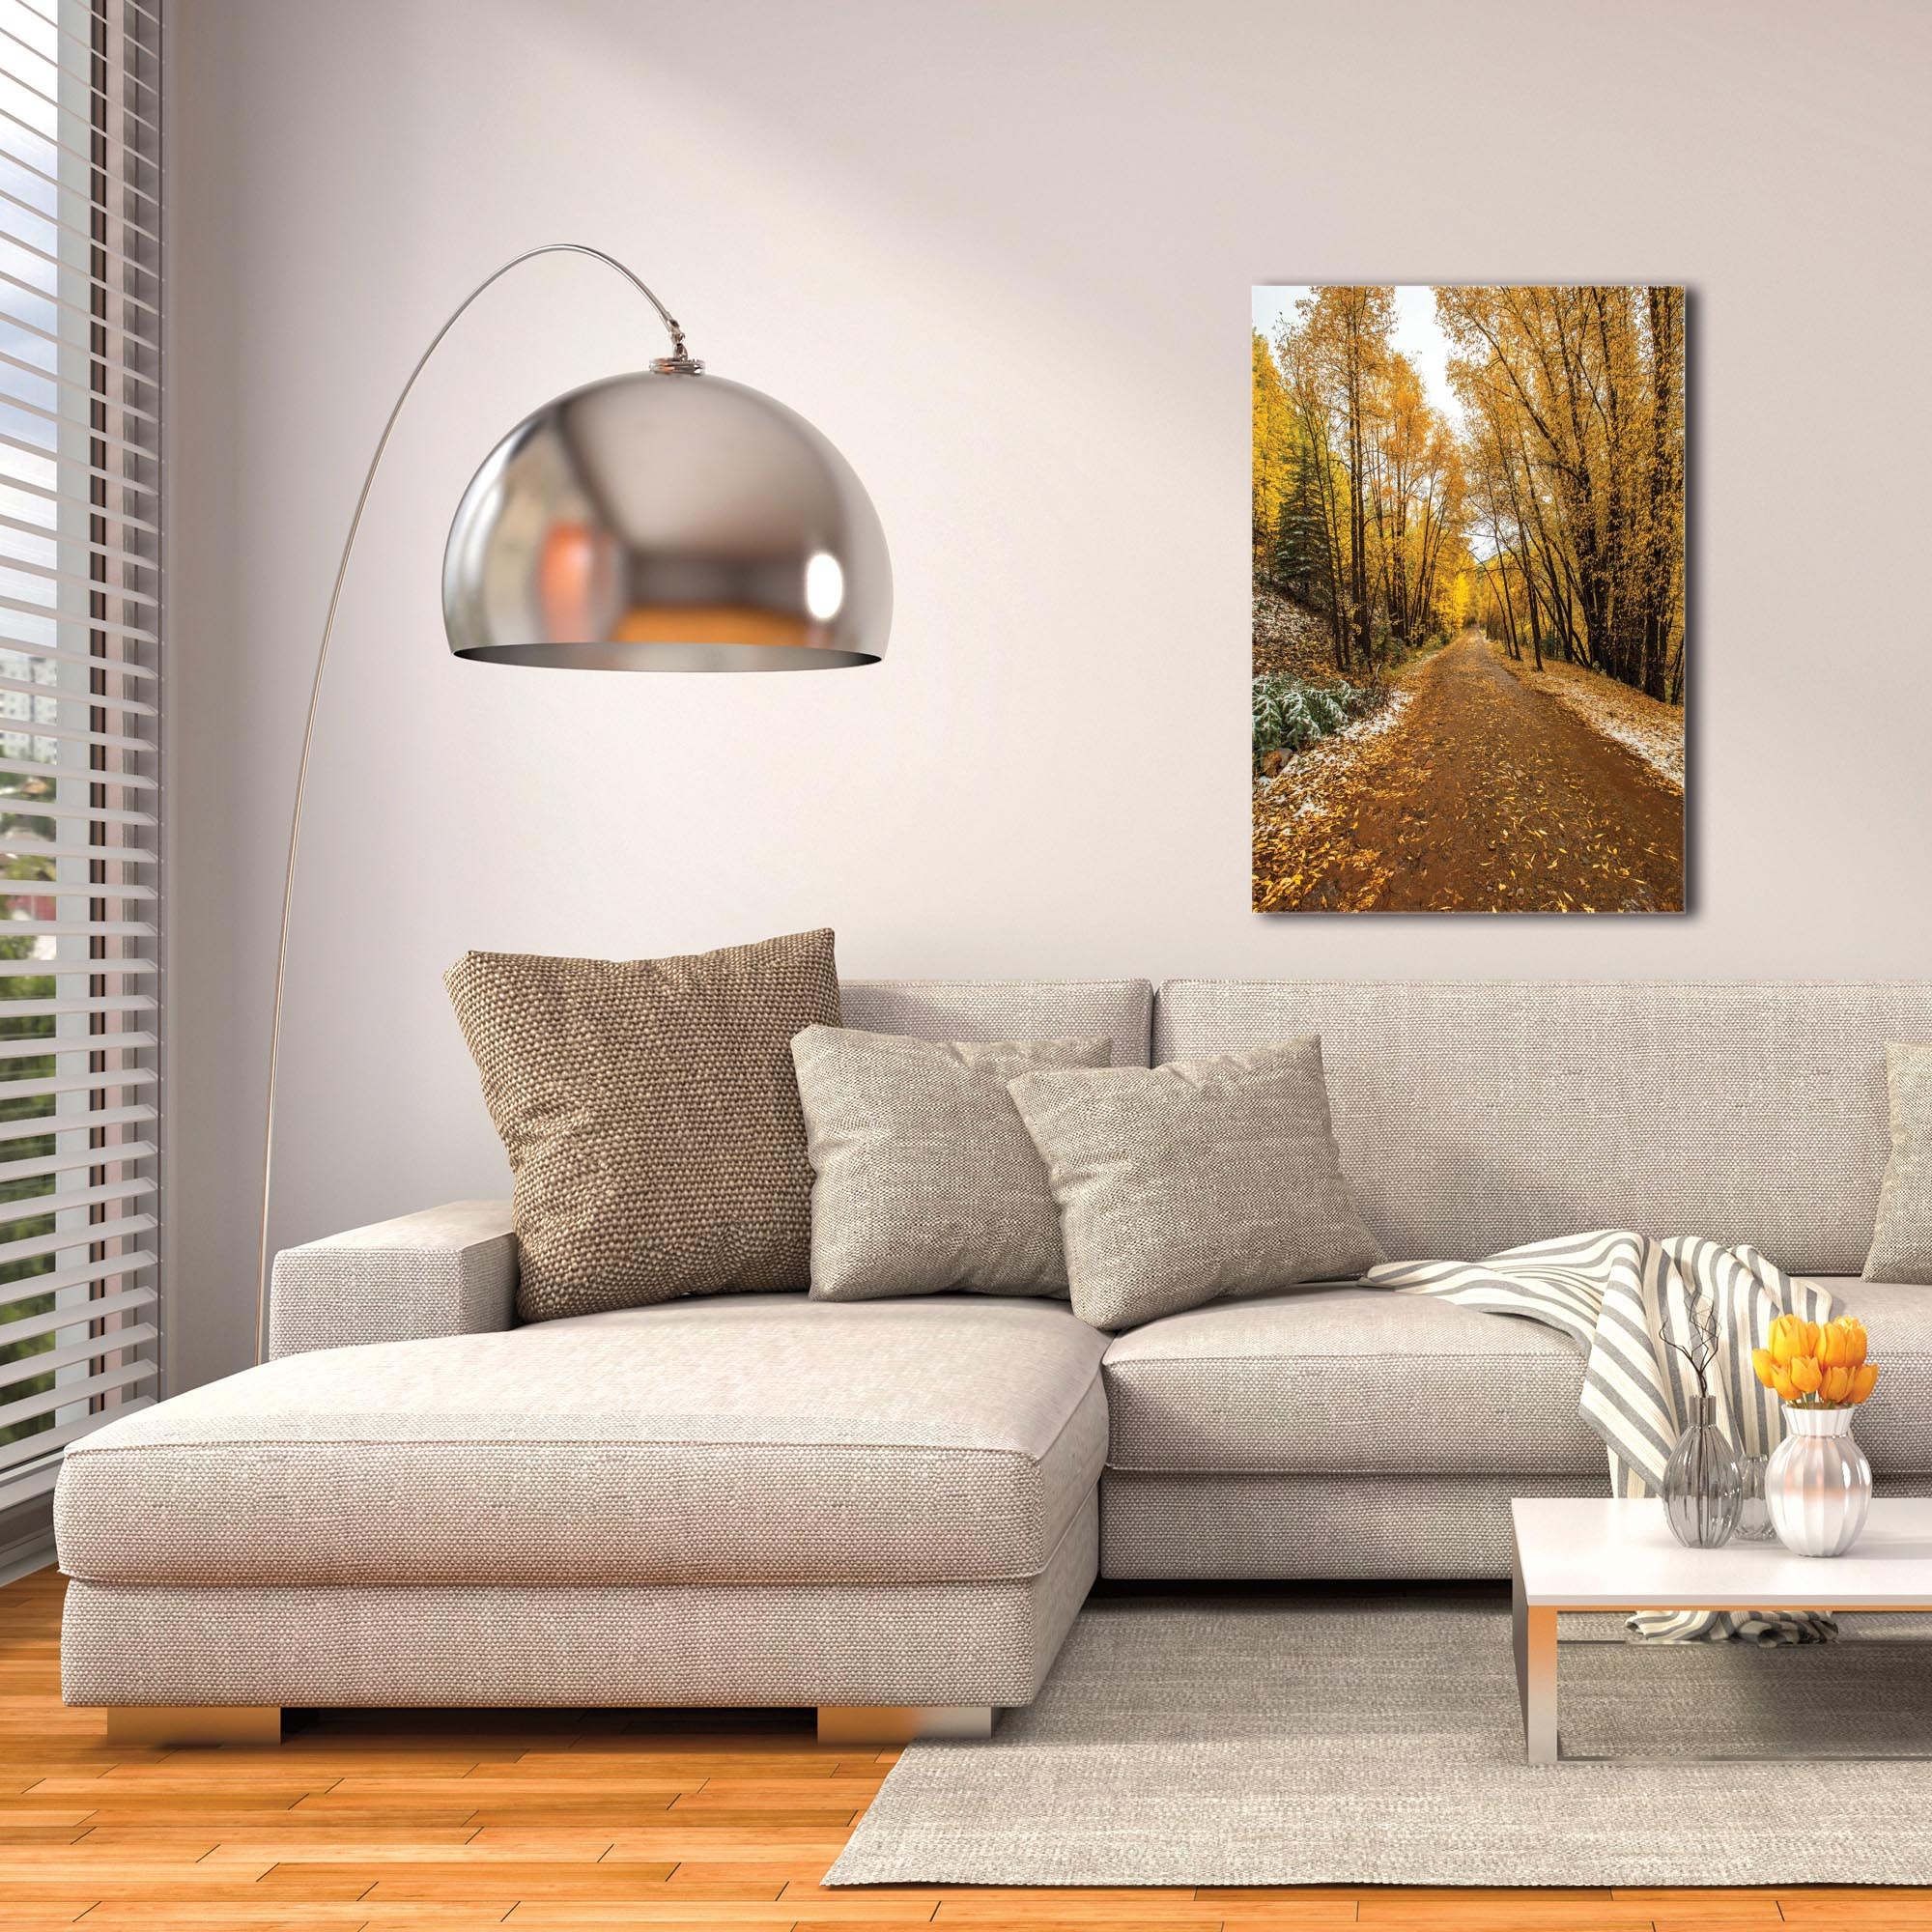 Landscape Photography 'Mountain Pass' - Autumn Trees Art on Metal or Plexiglass - Image 3